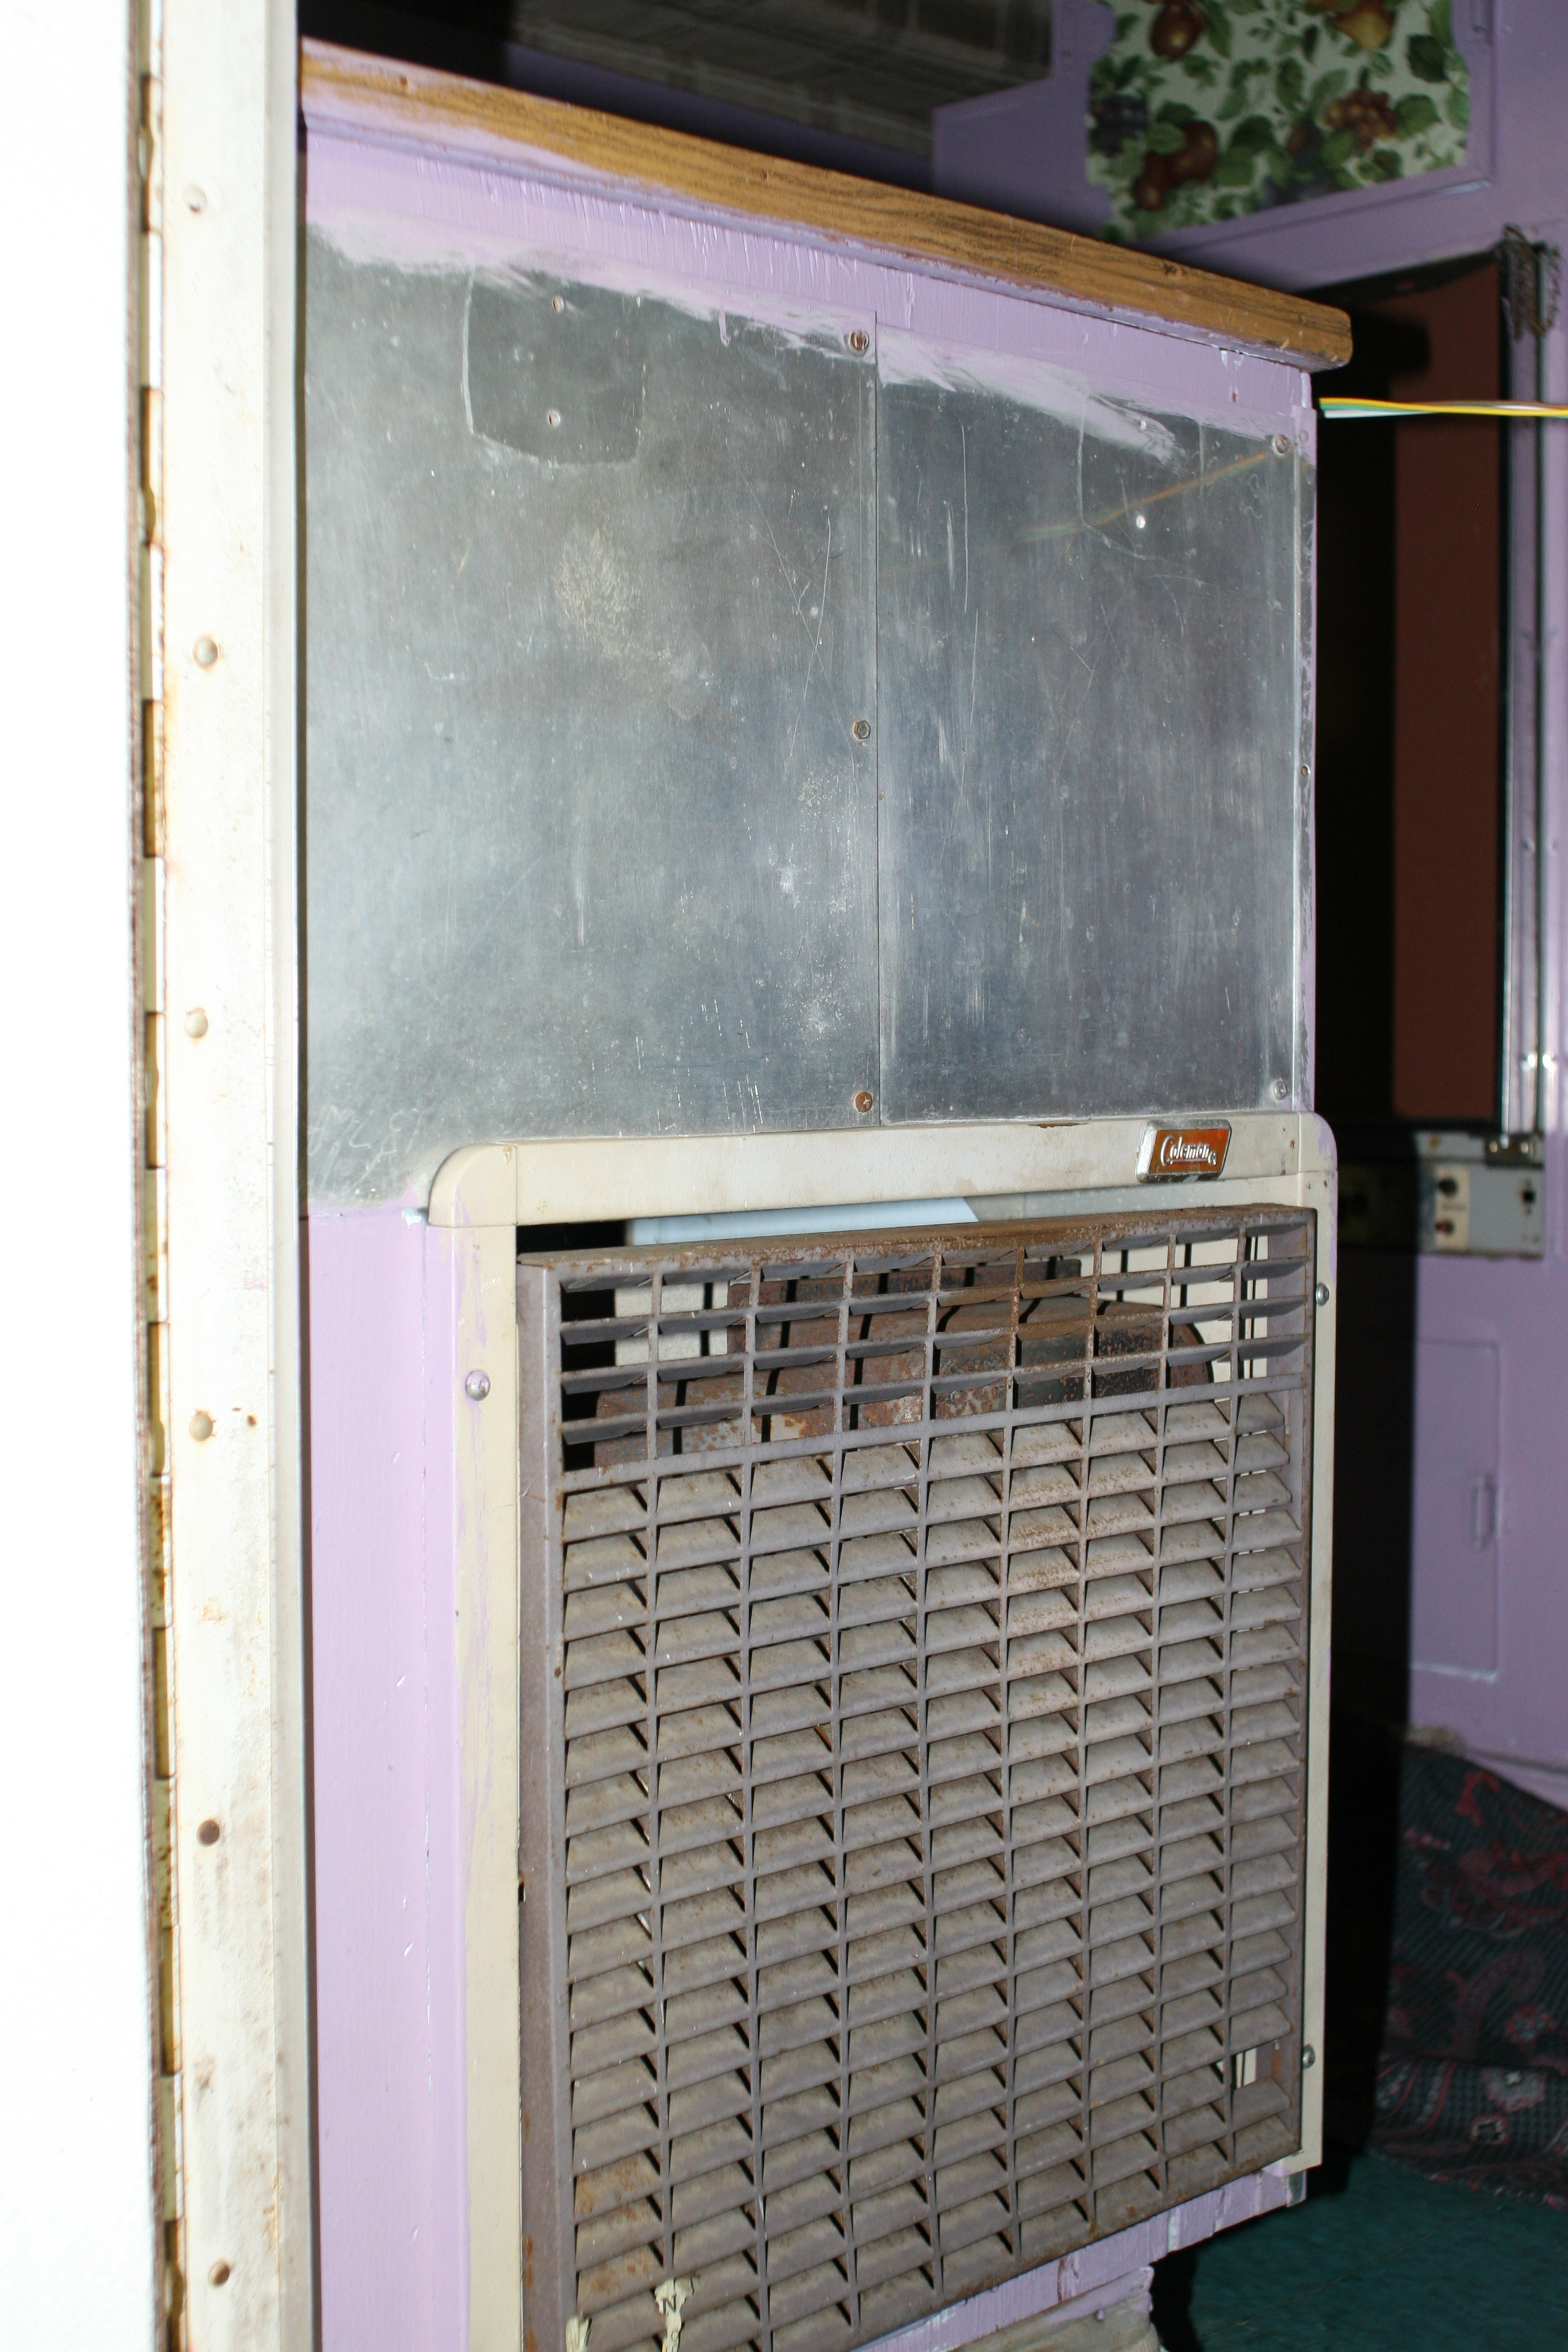 Propane furnace.